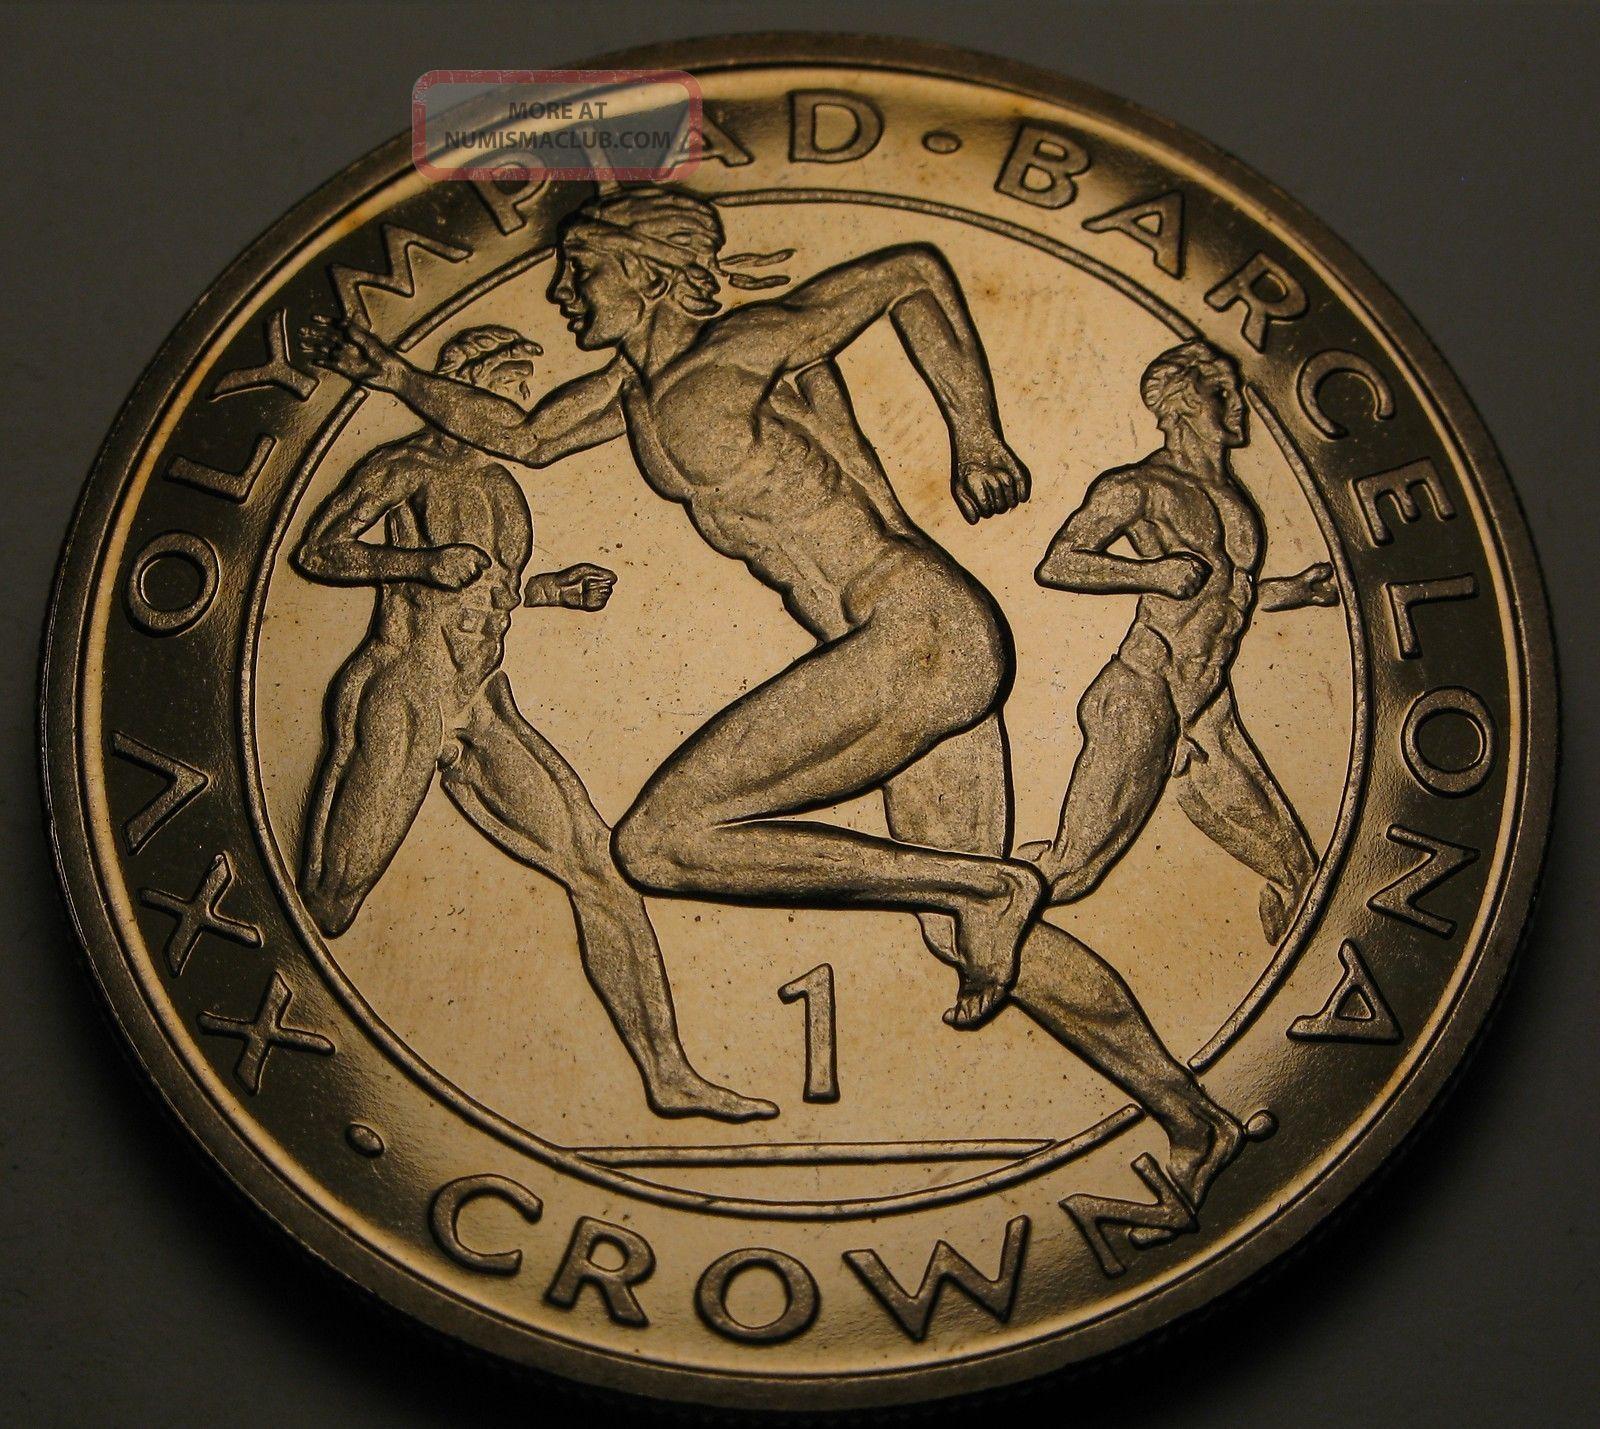 Gibraltar 1 Crown 1991 Proof - Barcelona Olympics - Elizabeth Ii.  1086 Europe photo